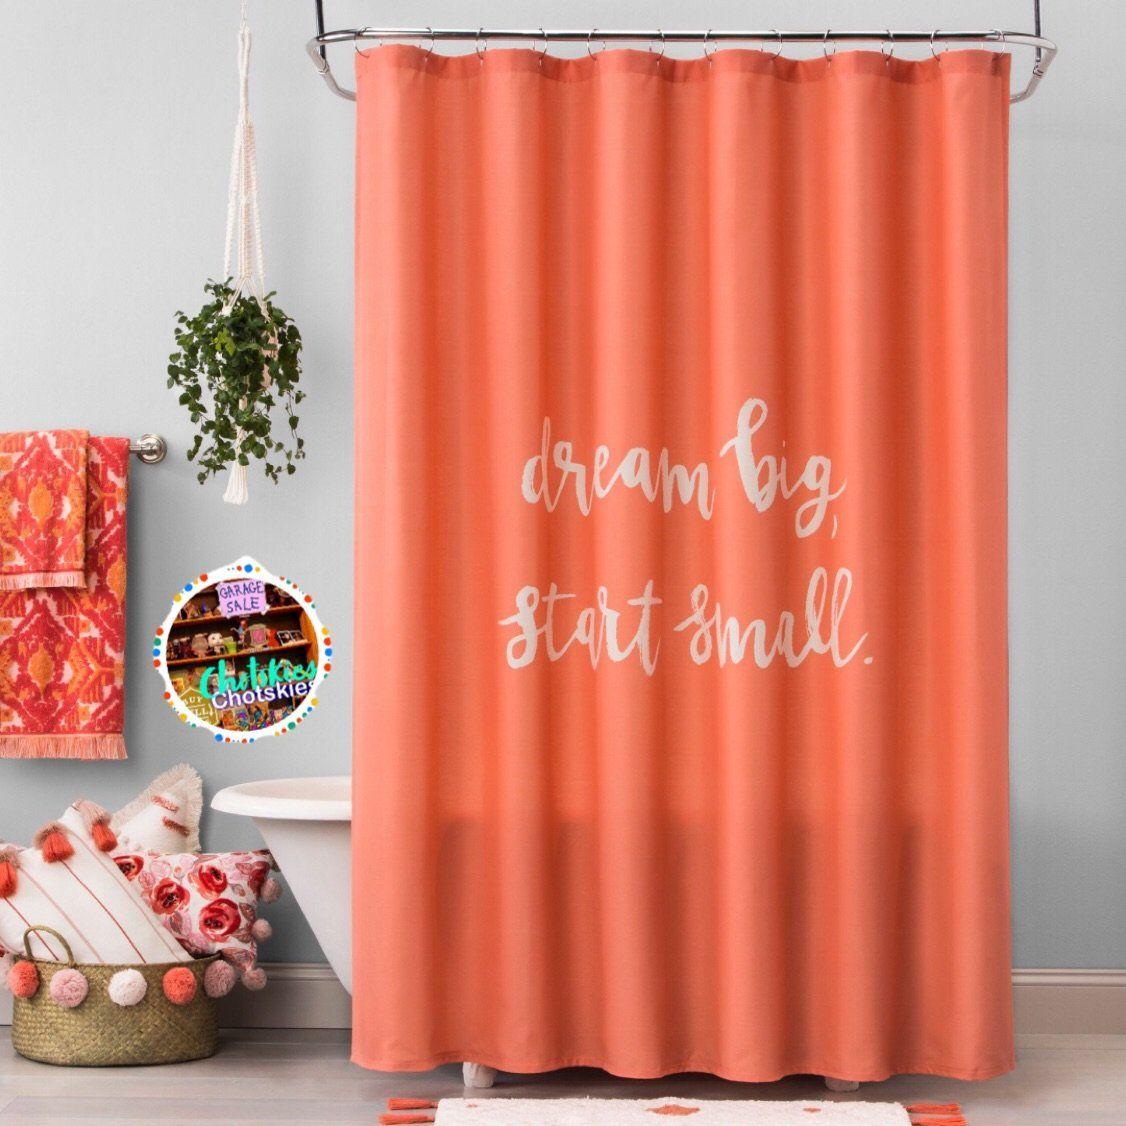 Dream Big Shower Curtain Georgia Clay 72 Big Shower Dream Big Shower Curtain